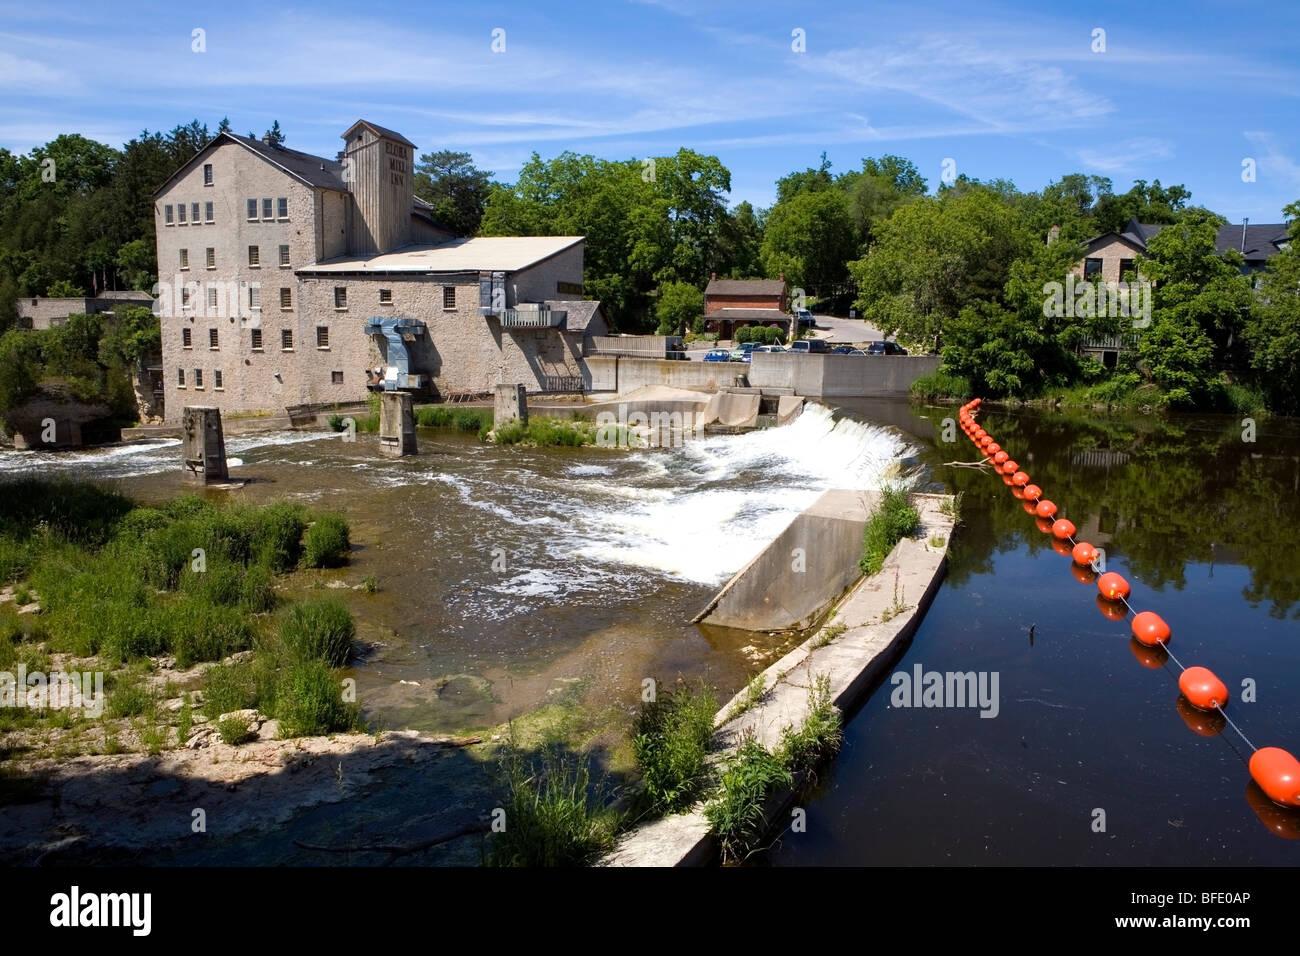 Elora Mill Inn, Elora, Ontario, Canada - Stock Image